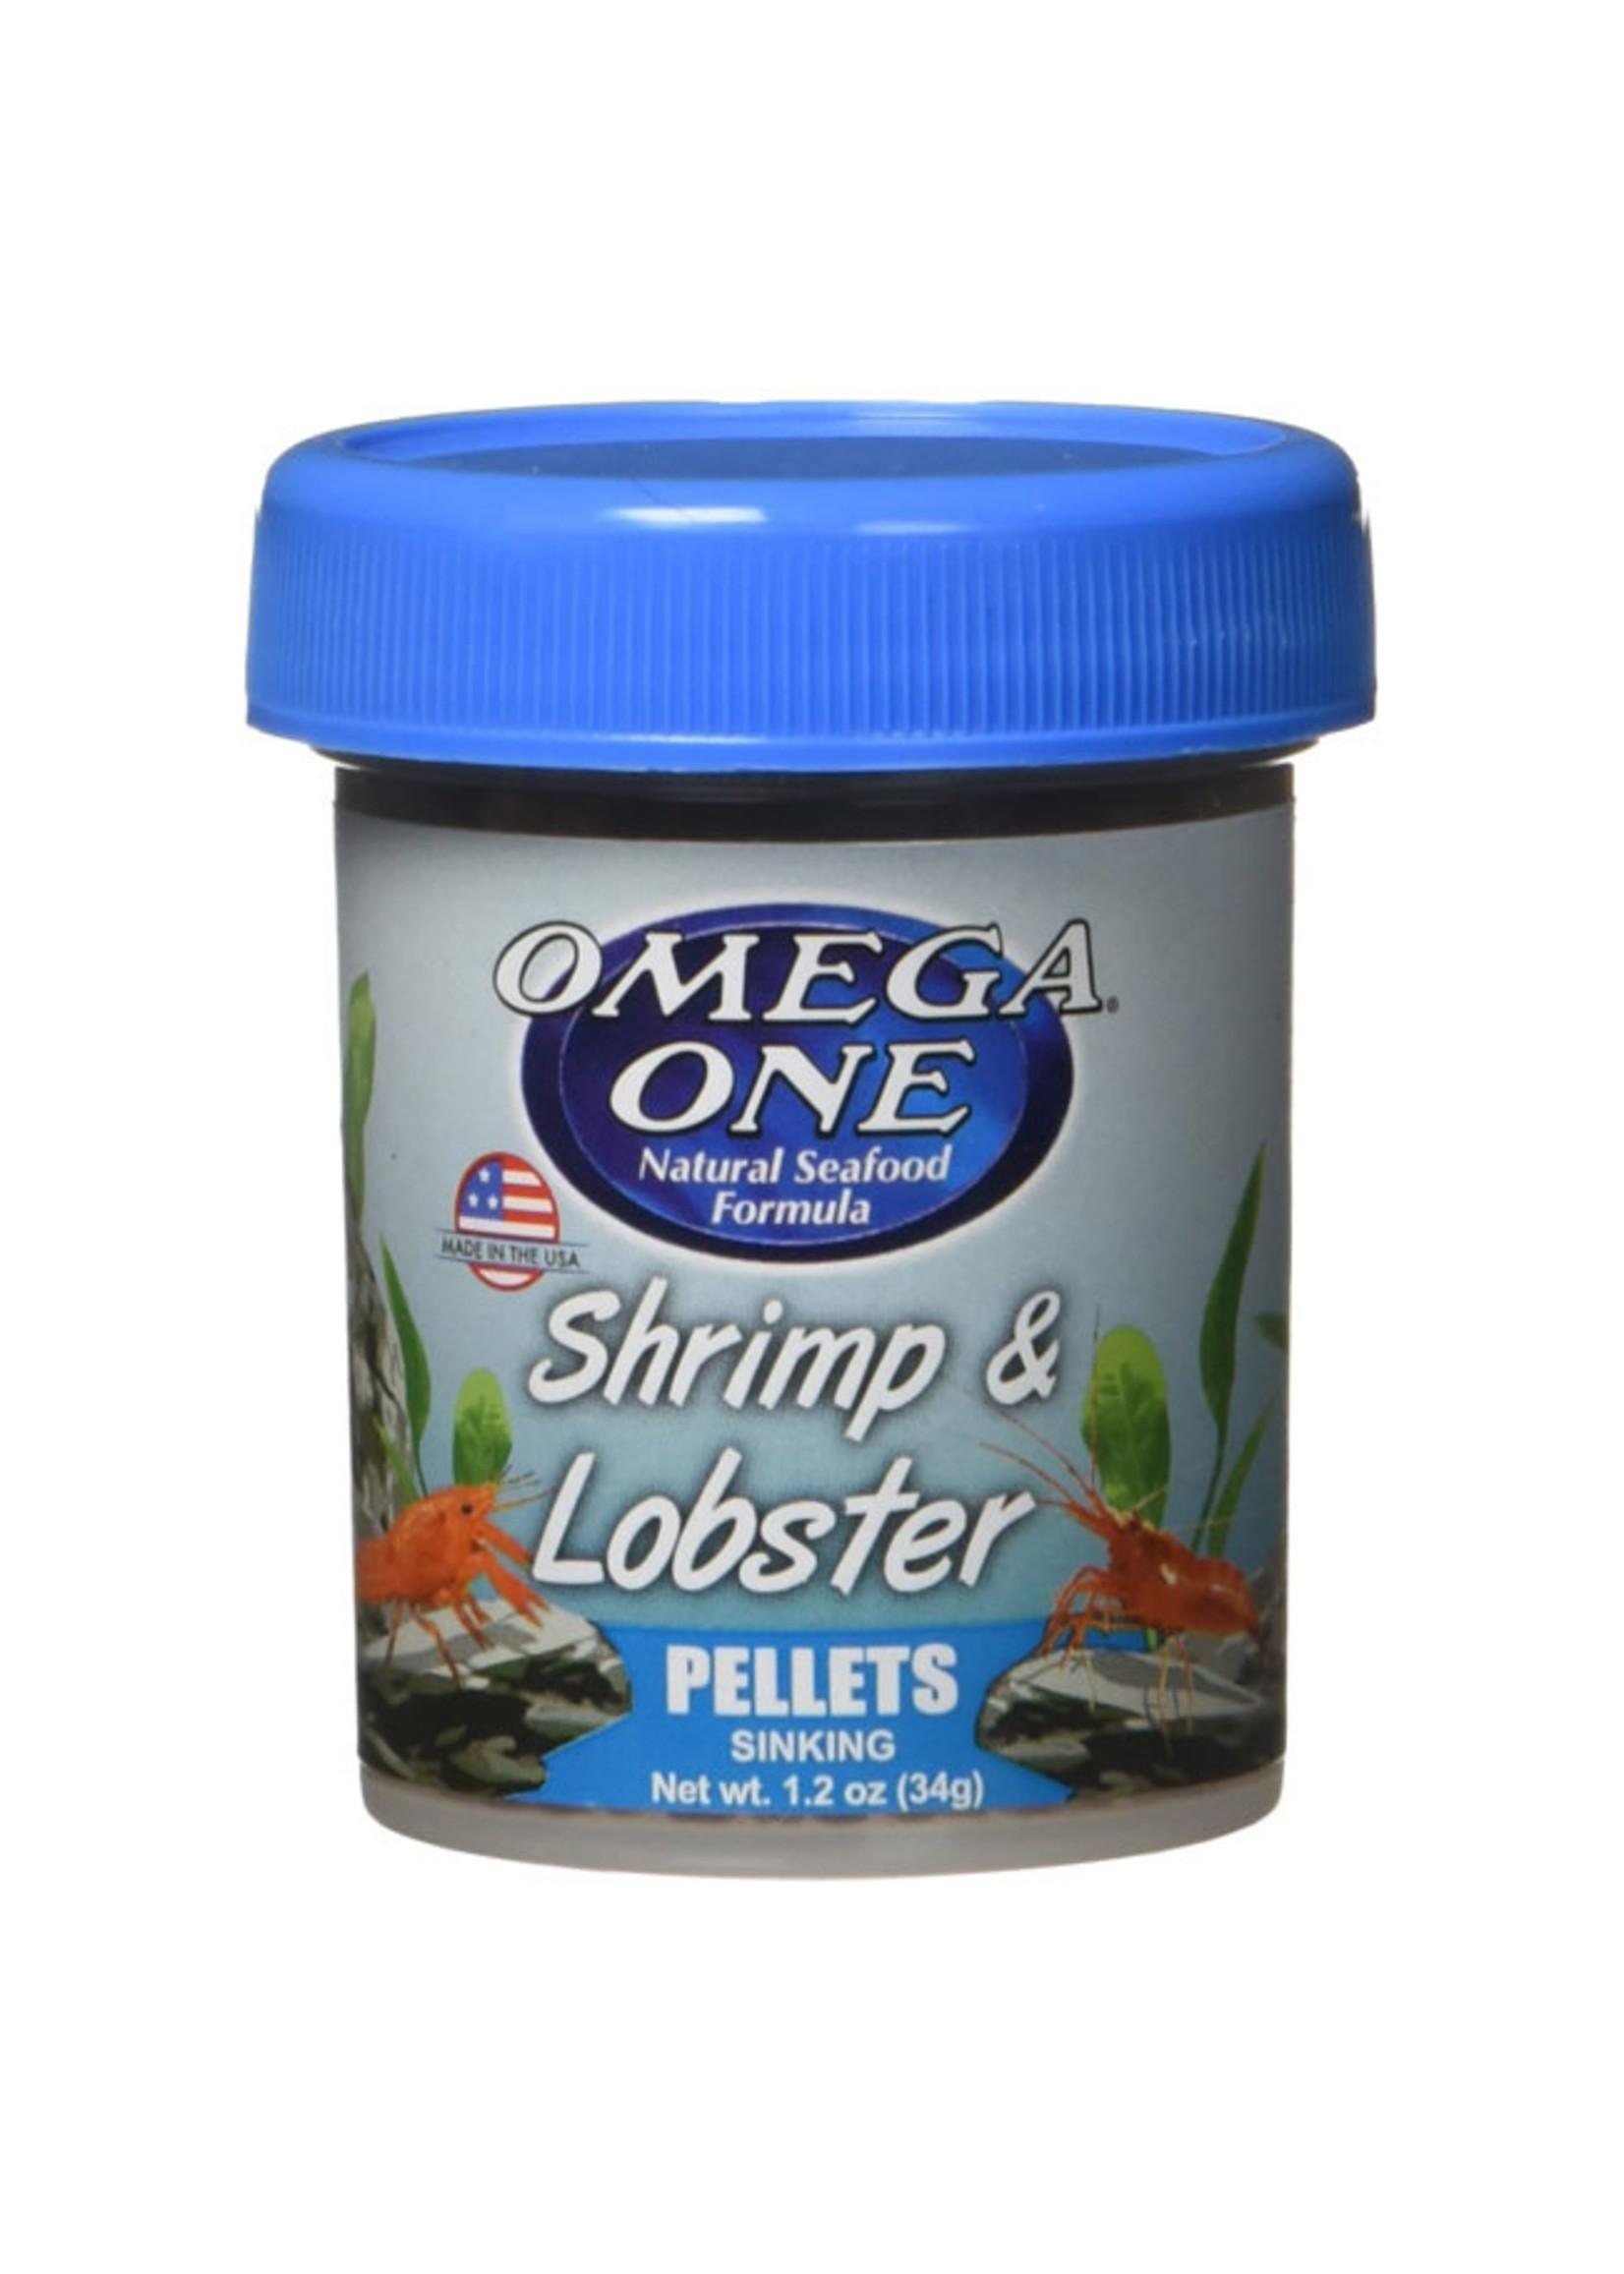 Omega One Omega One Shrimp & Lobster Sinking Pellets 34g / 1.2oz